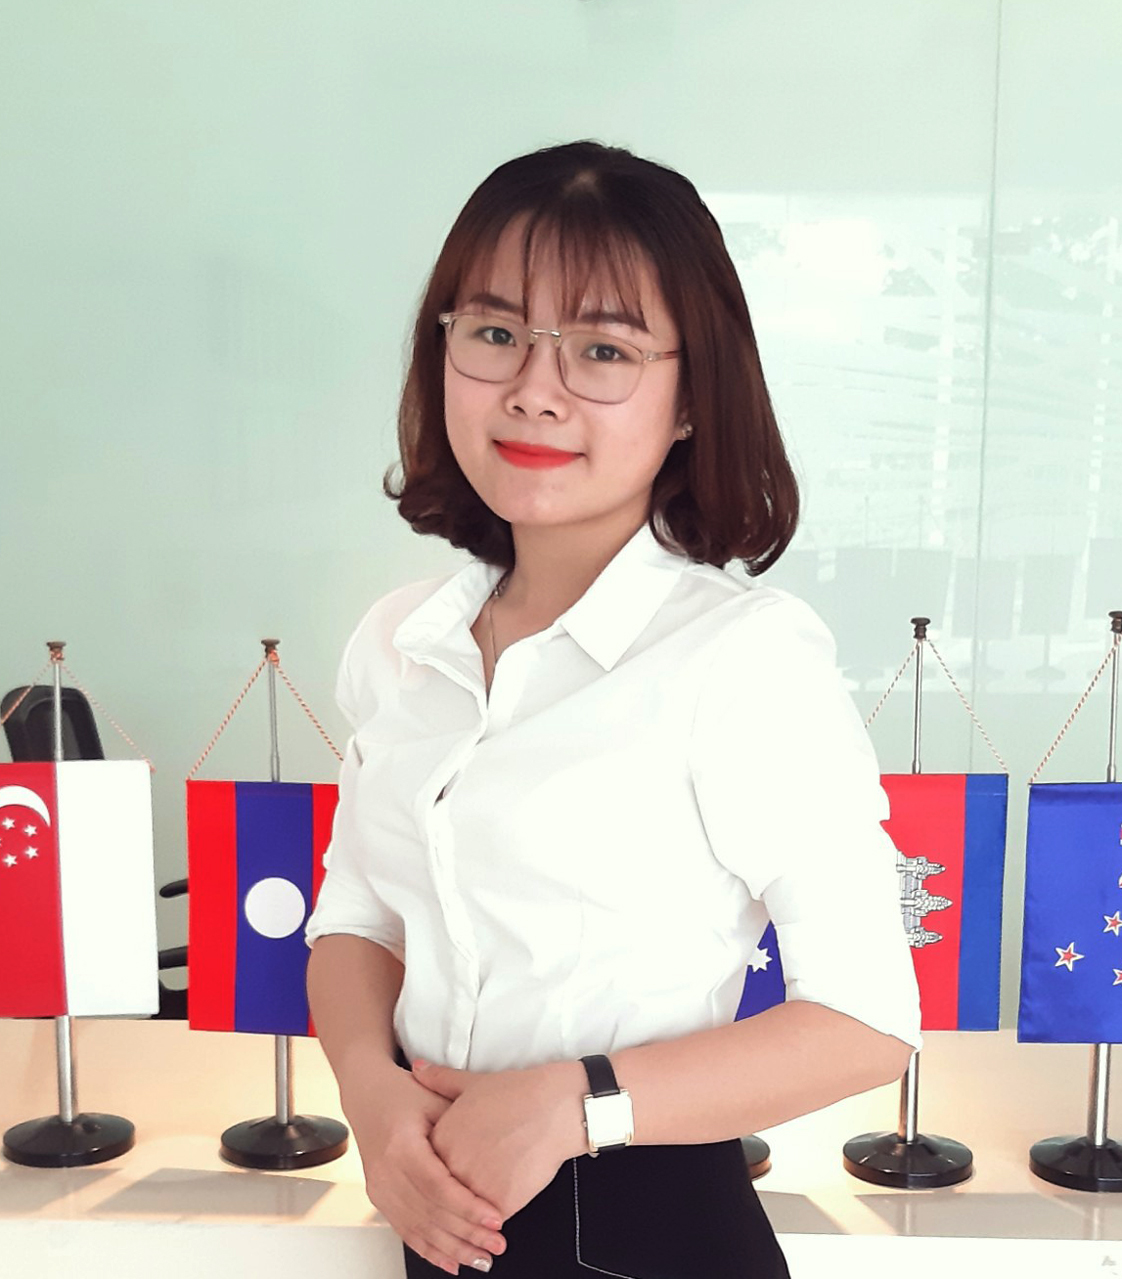 Ms. Vo Mai Phuong (Lucy)